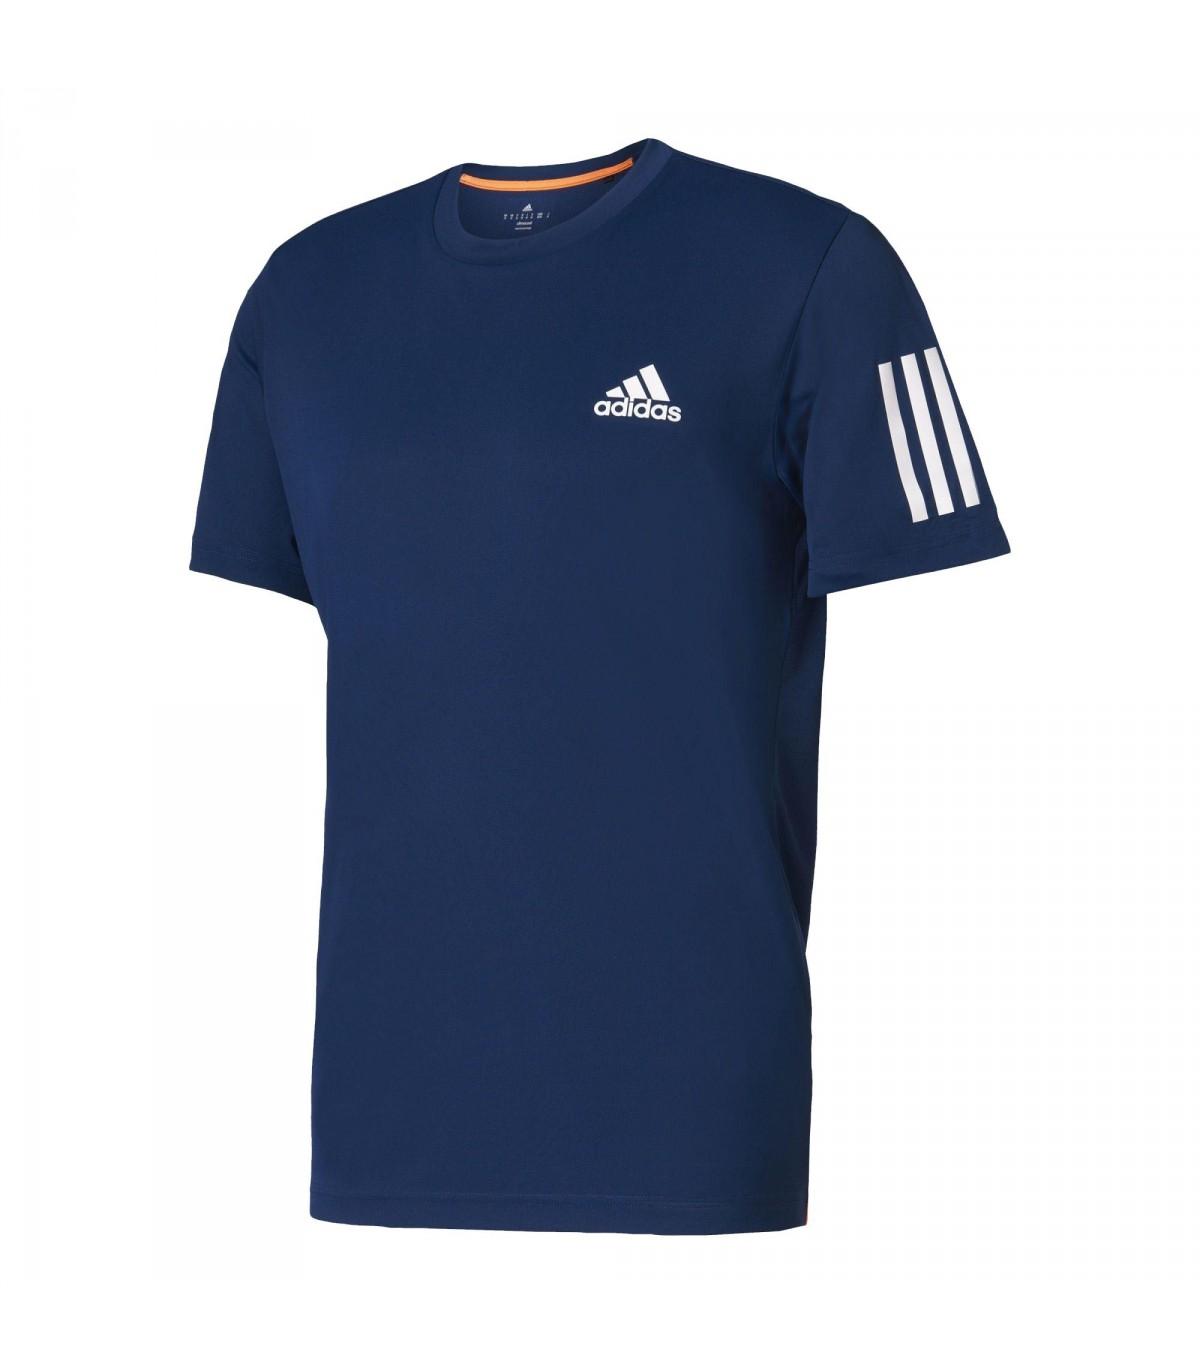 c7c09bb4871 Men s Squash T-Shirt Adidas Club Tee – Mystery Blue  White